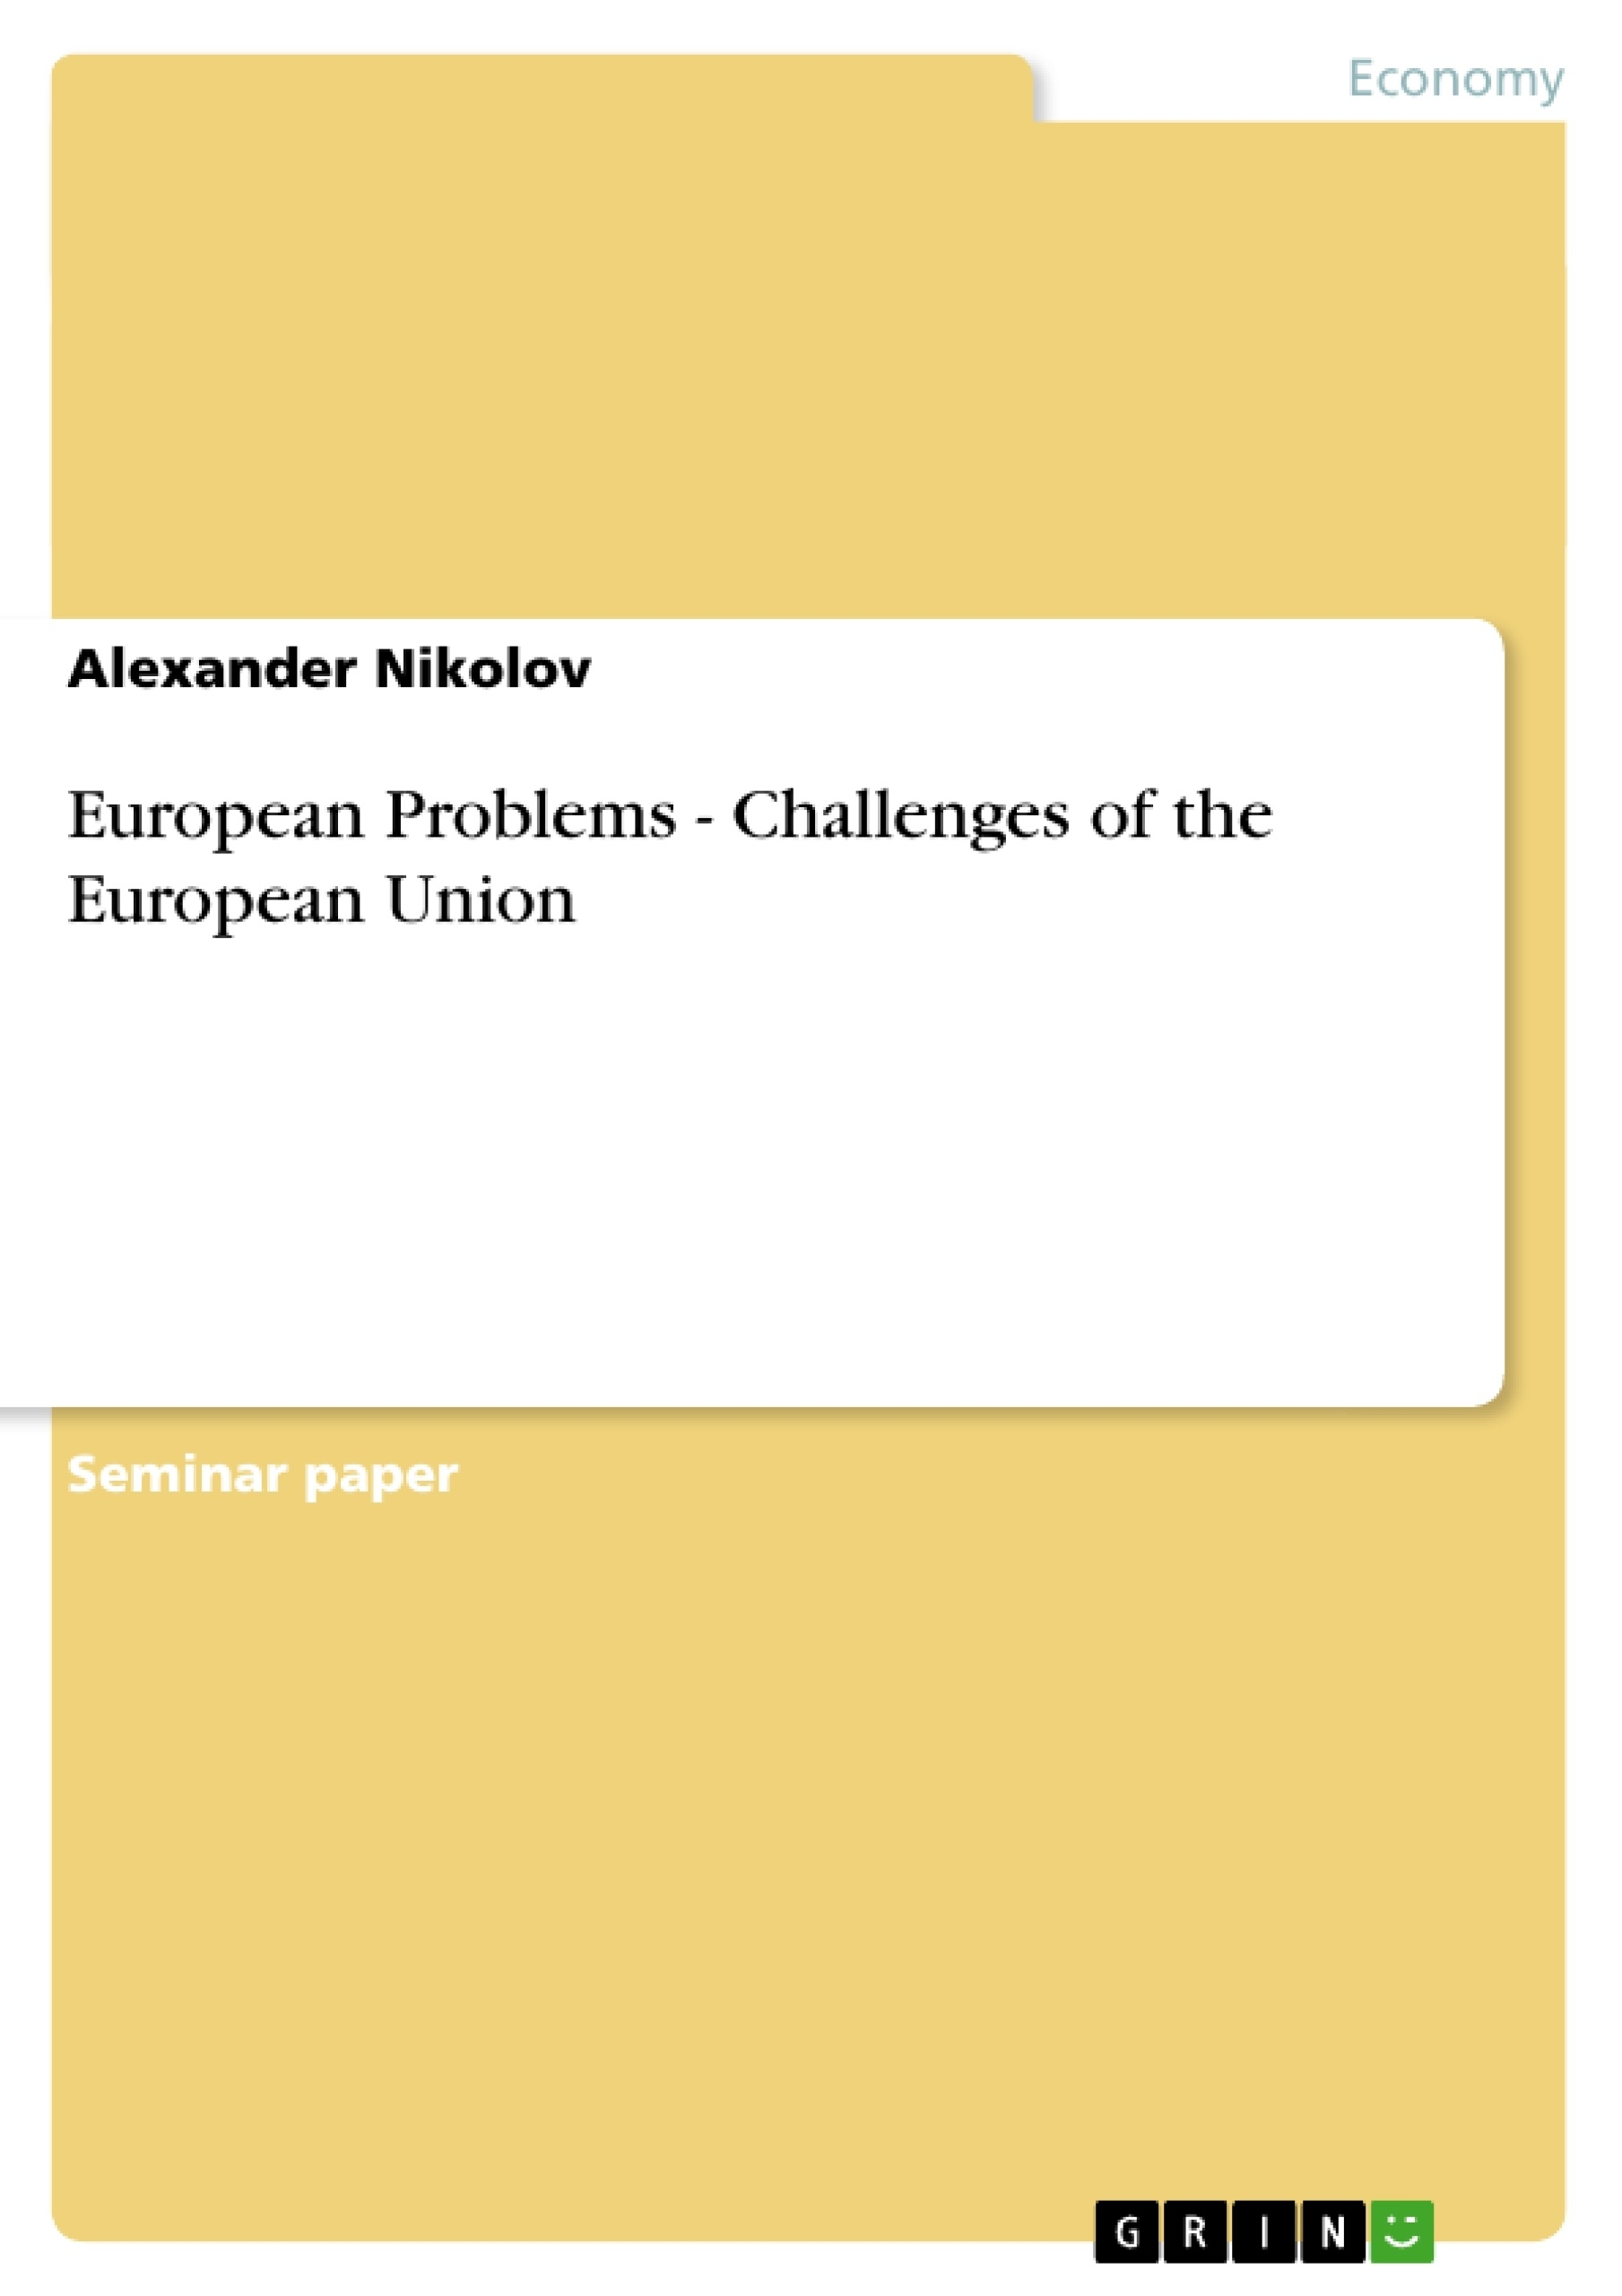 Title: European Problems - Challenges of the European Union